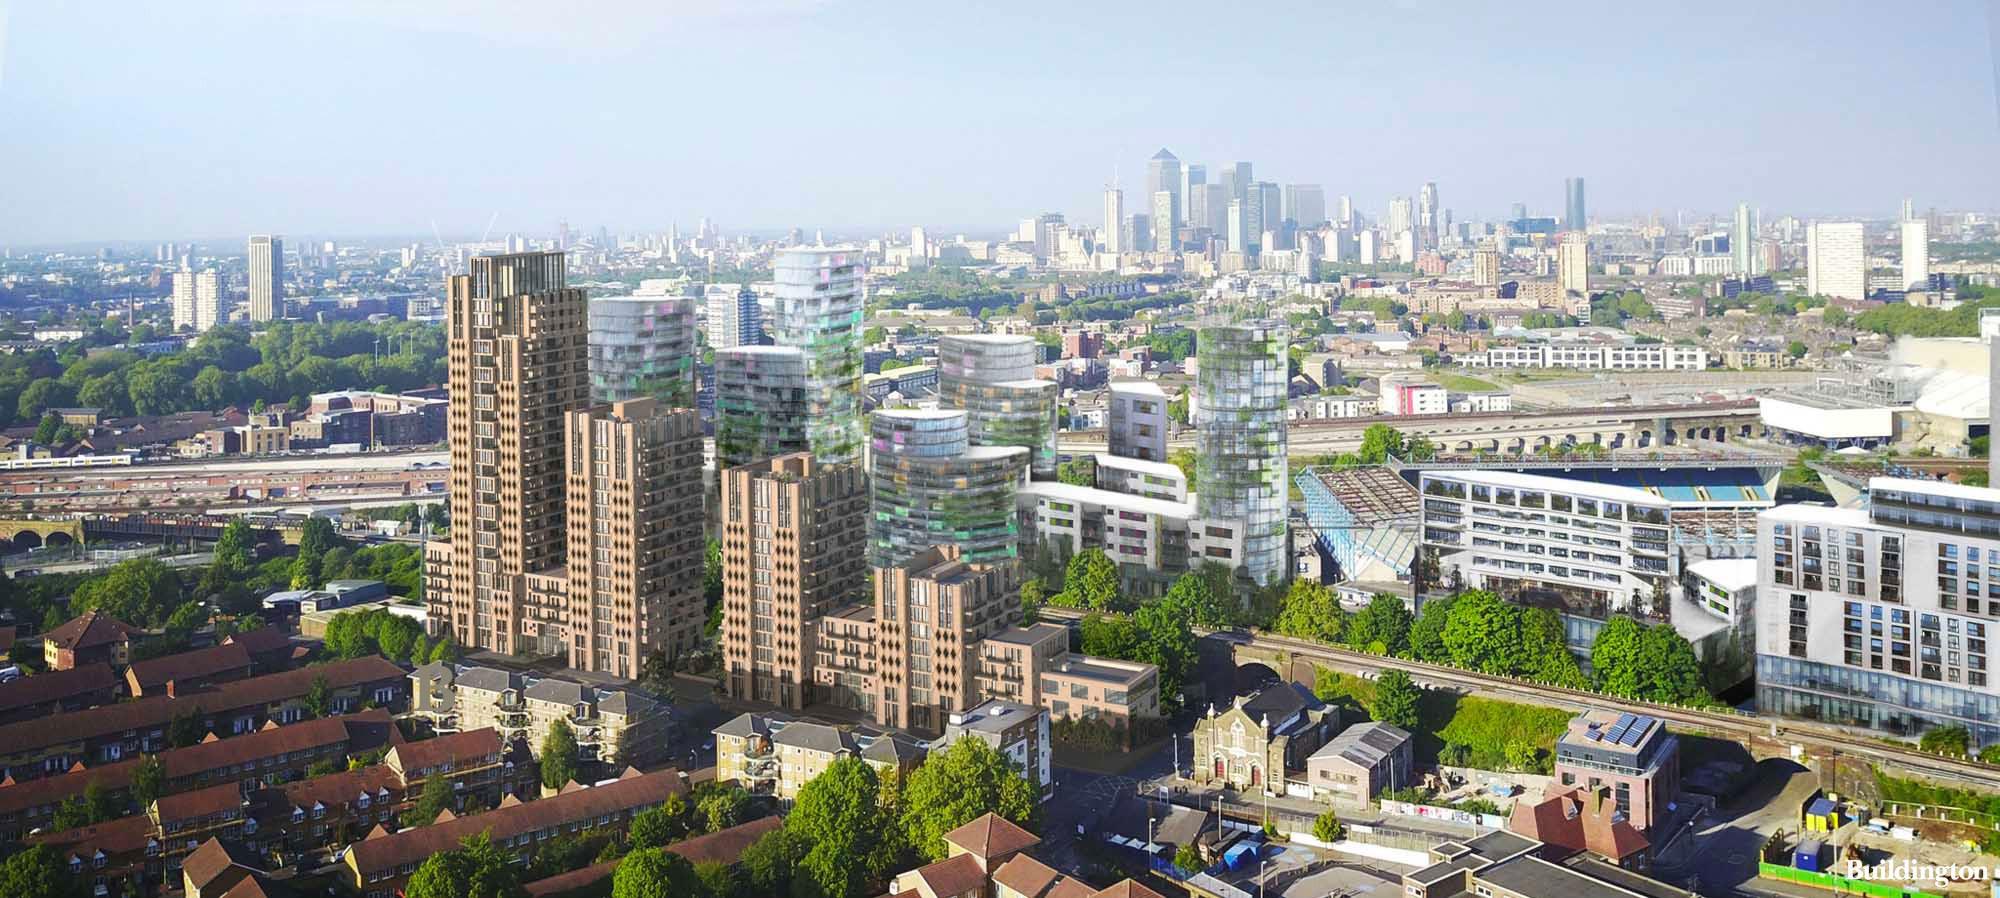 CGI Birds eye view of Bermondsey Reach development in Southwark.